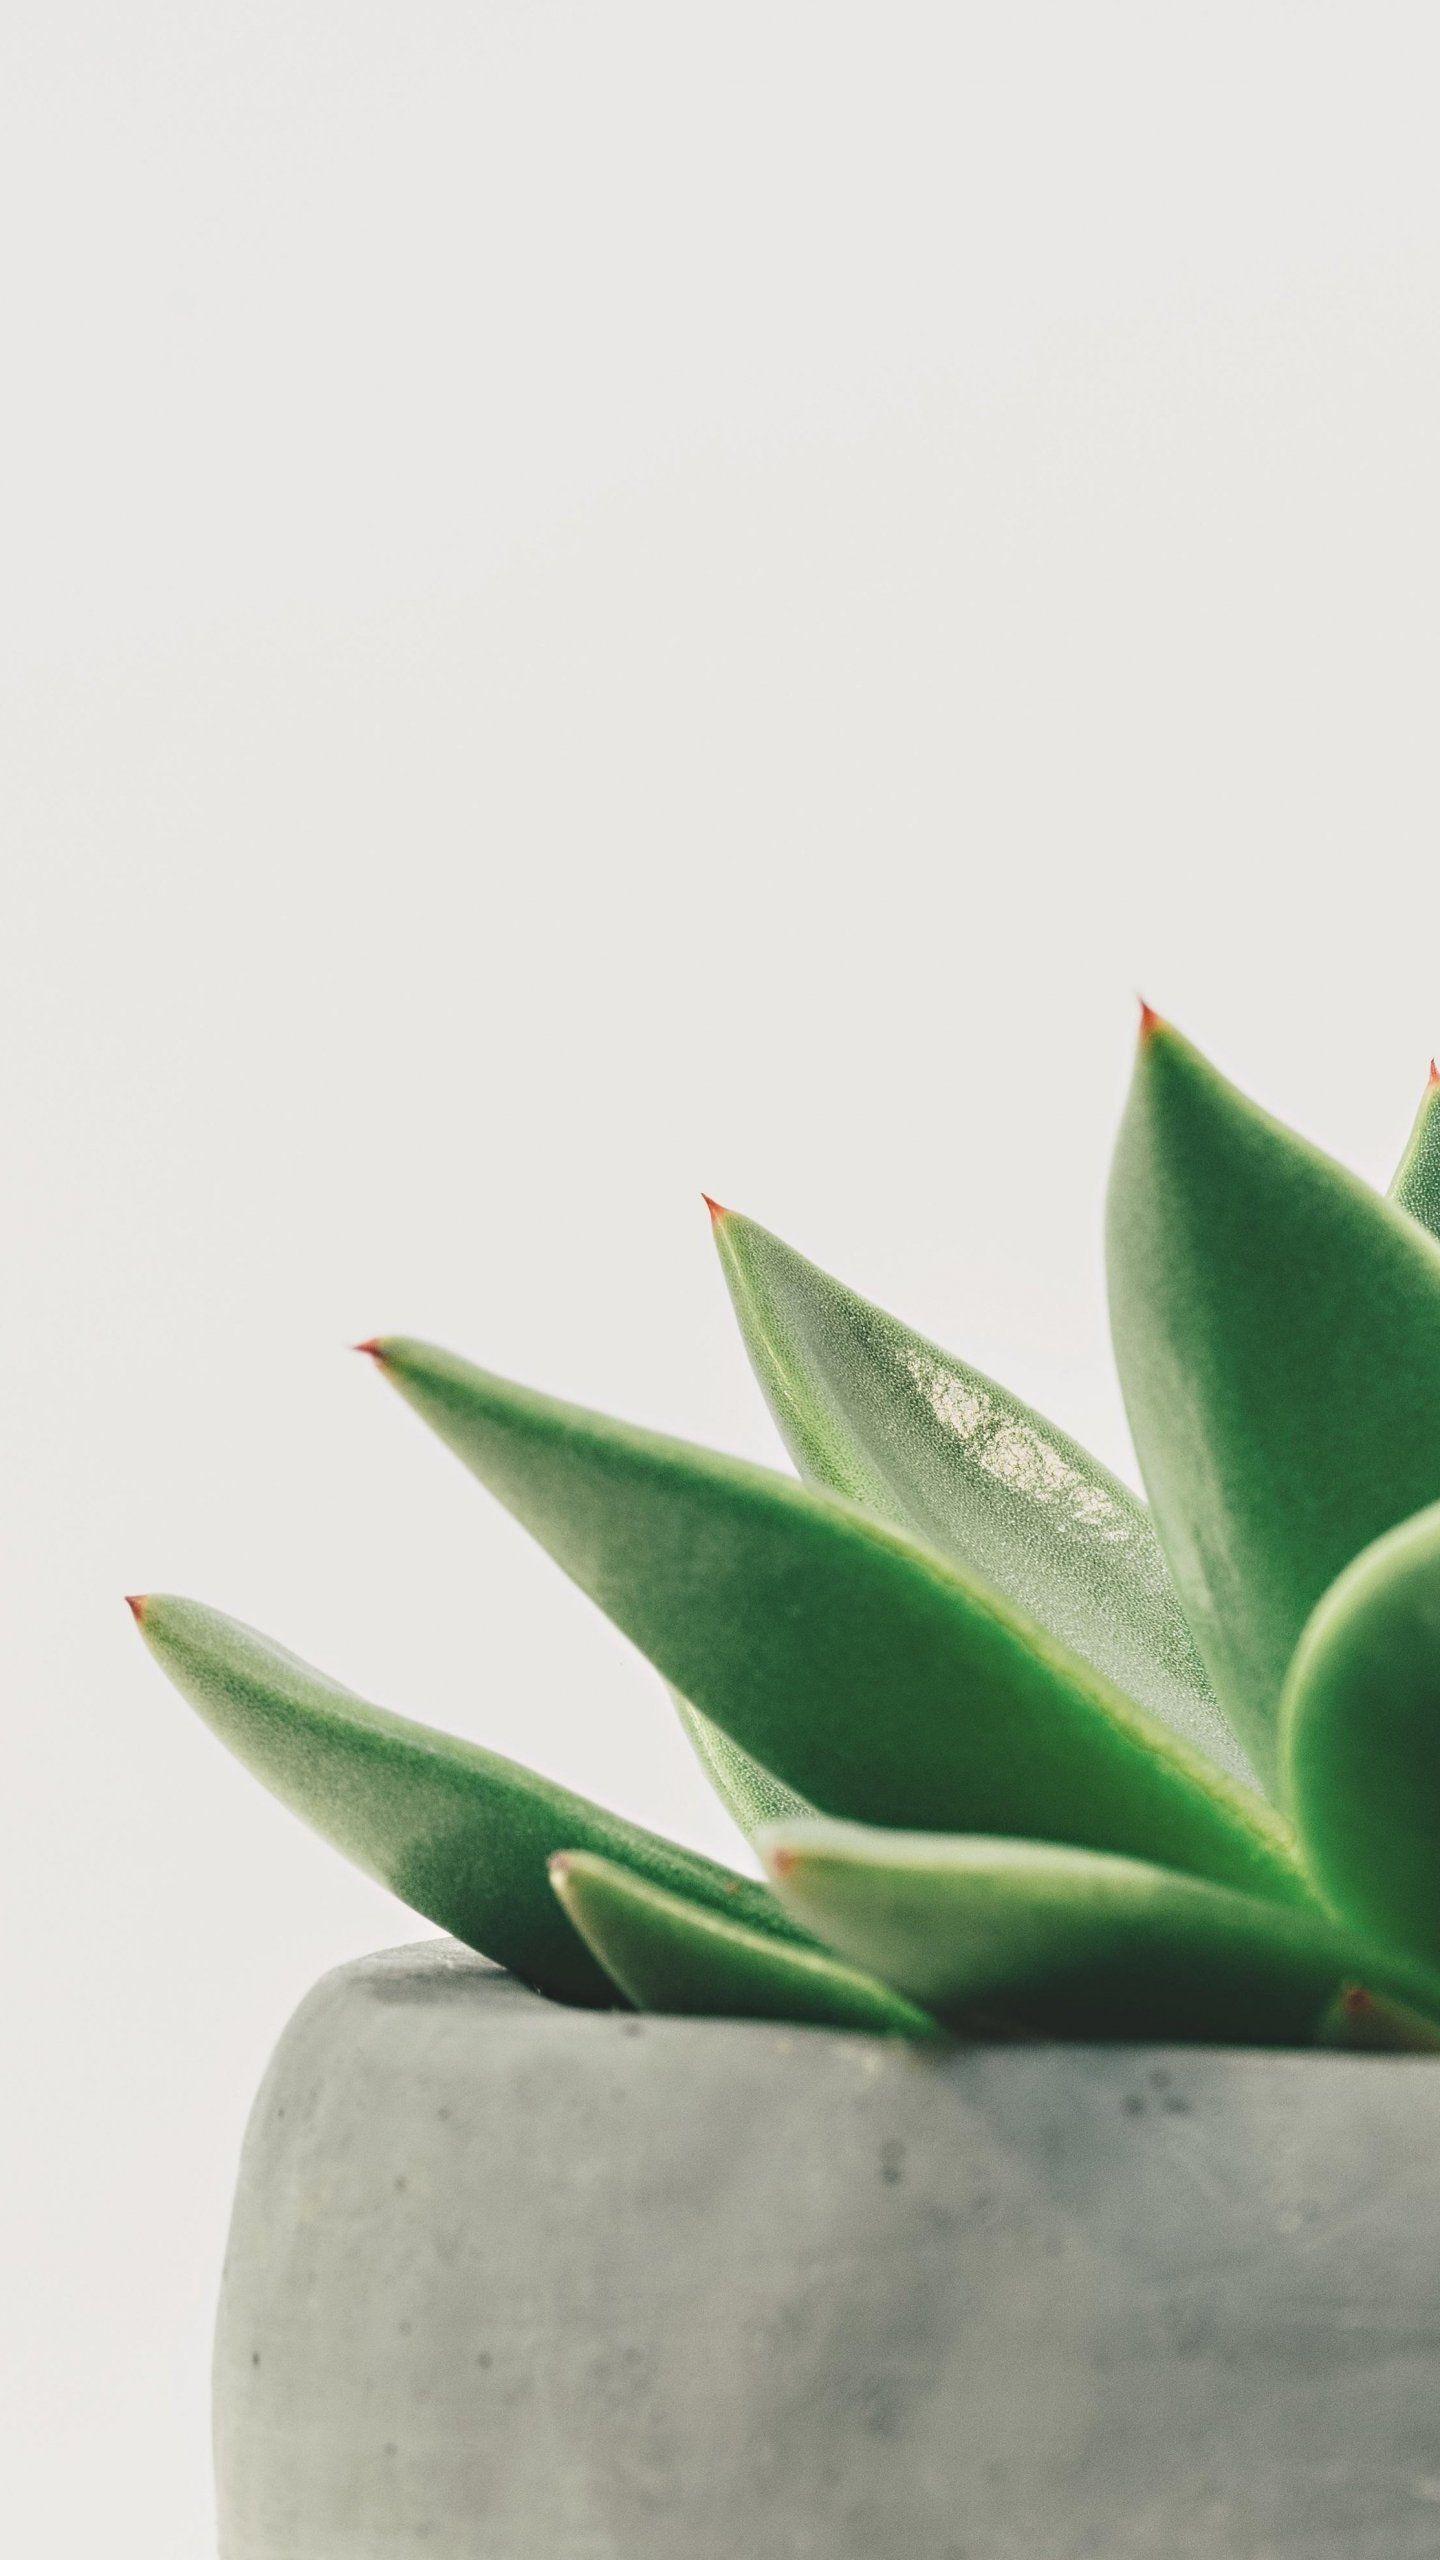 Minimalist Succulent Wallpaper iPhone, Android & Desktop